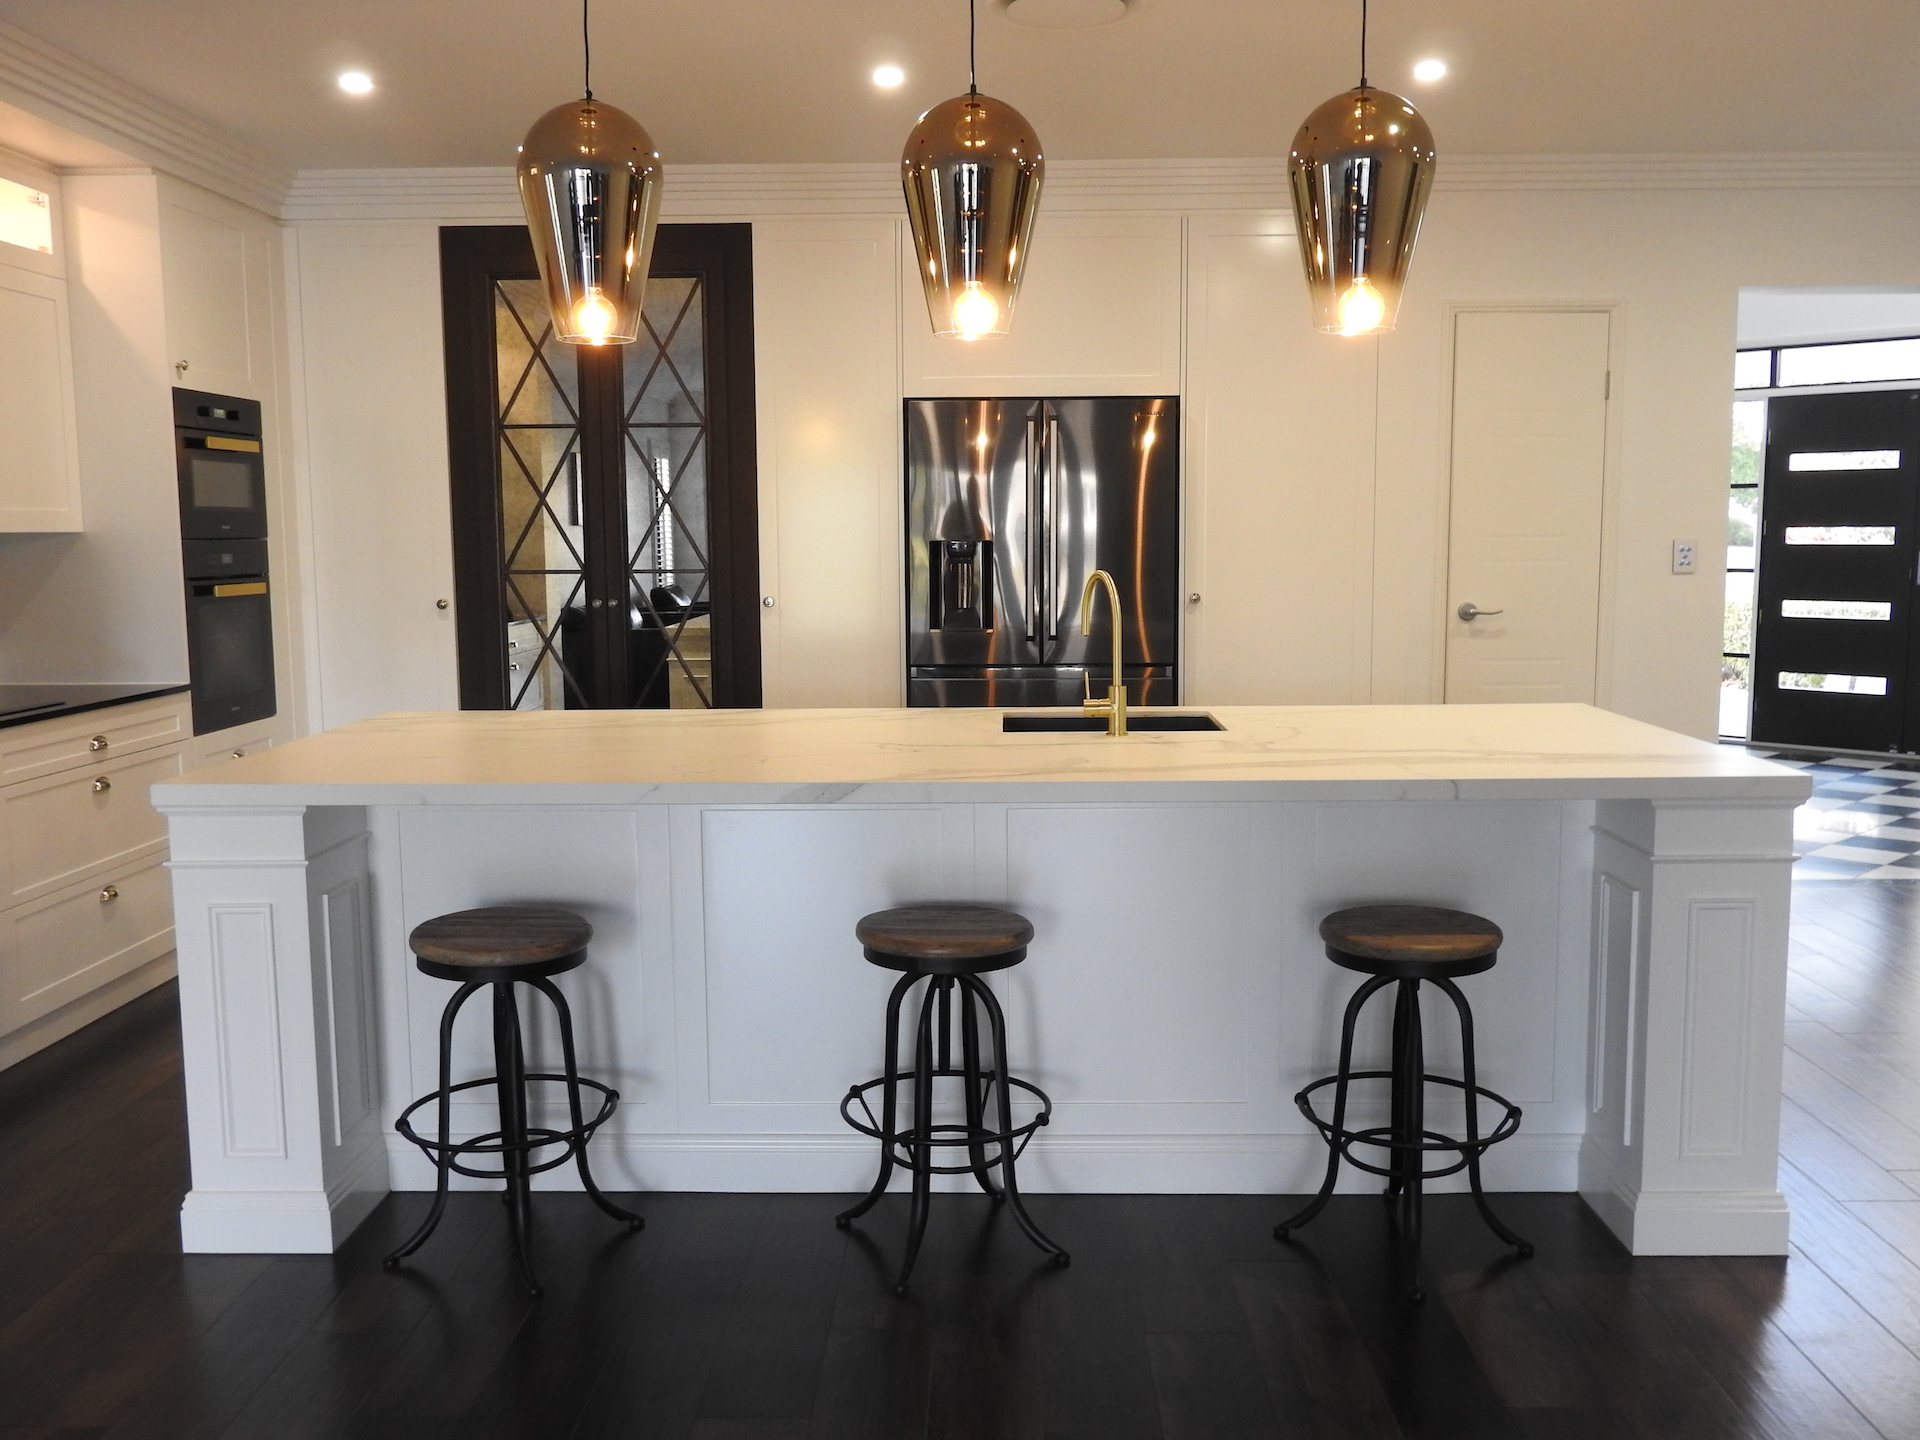 kitchens Gold coast 2